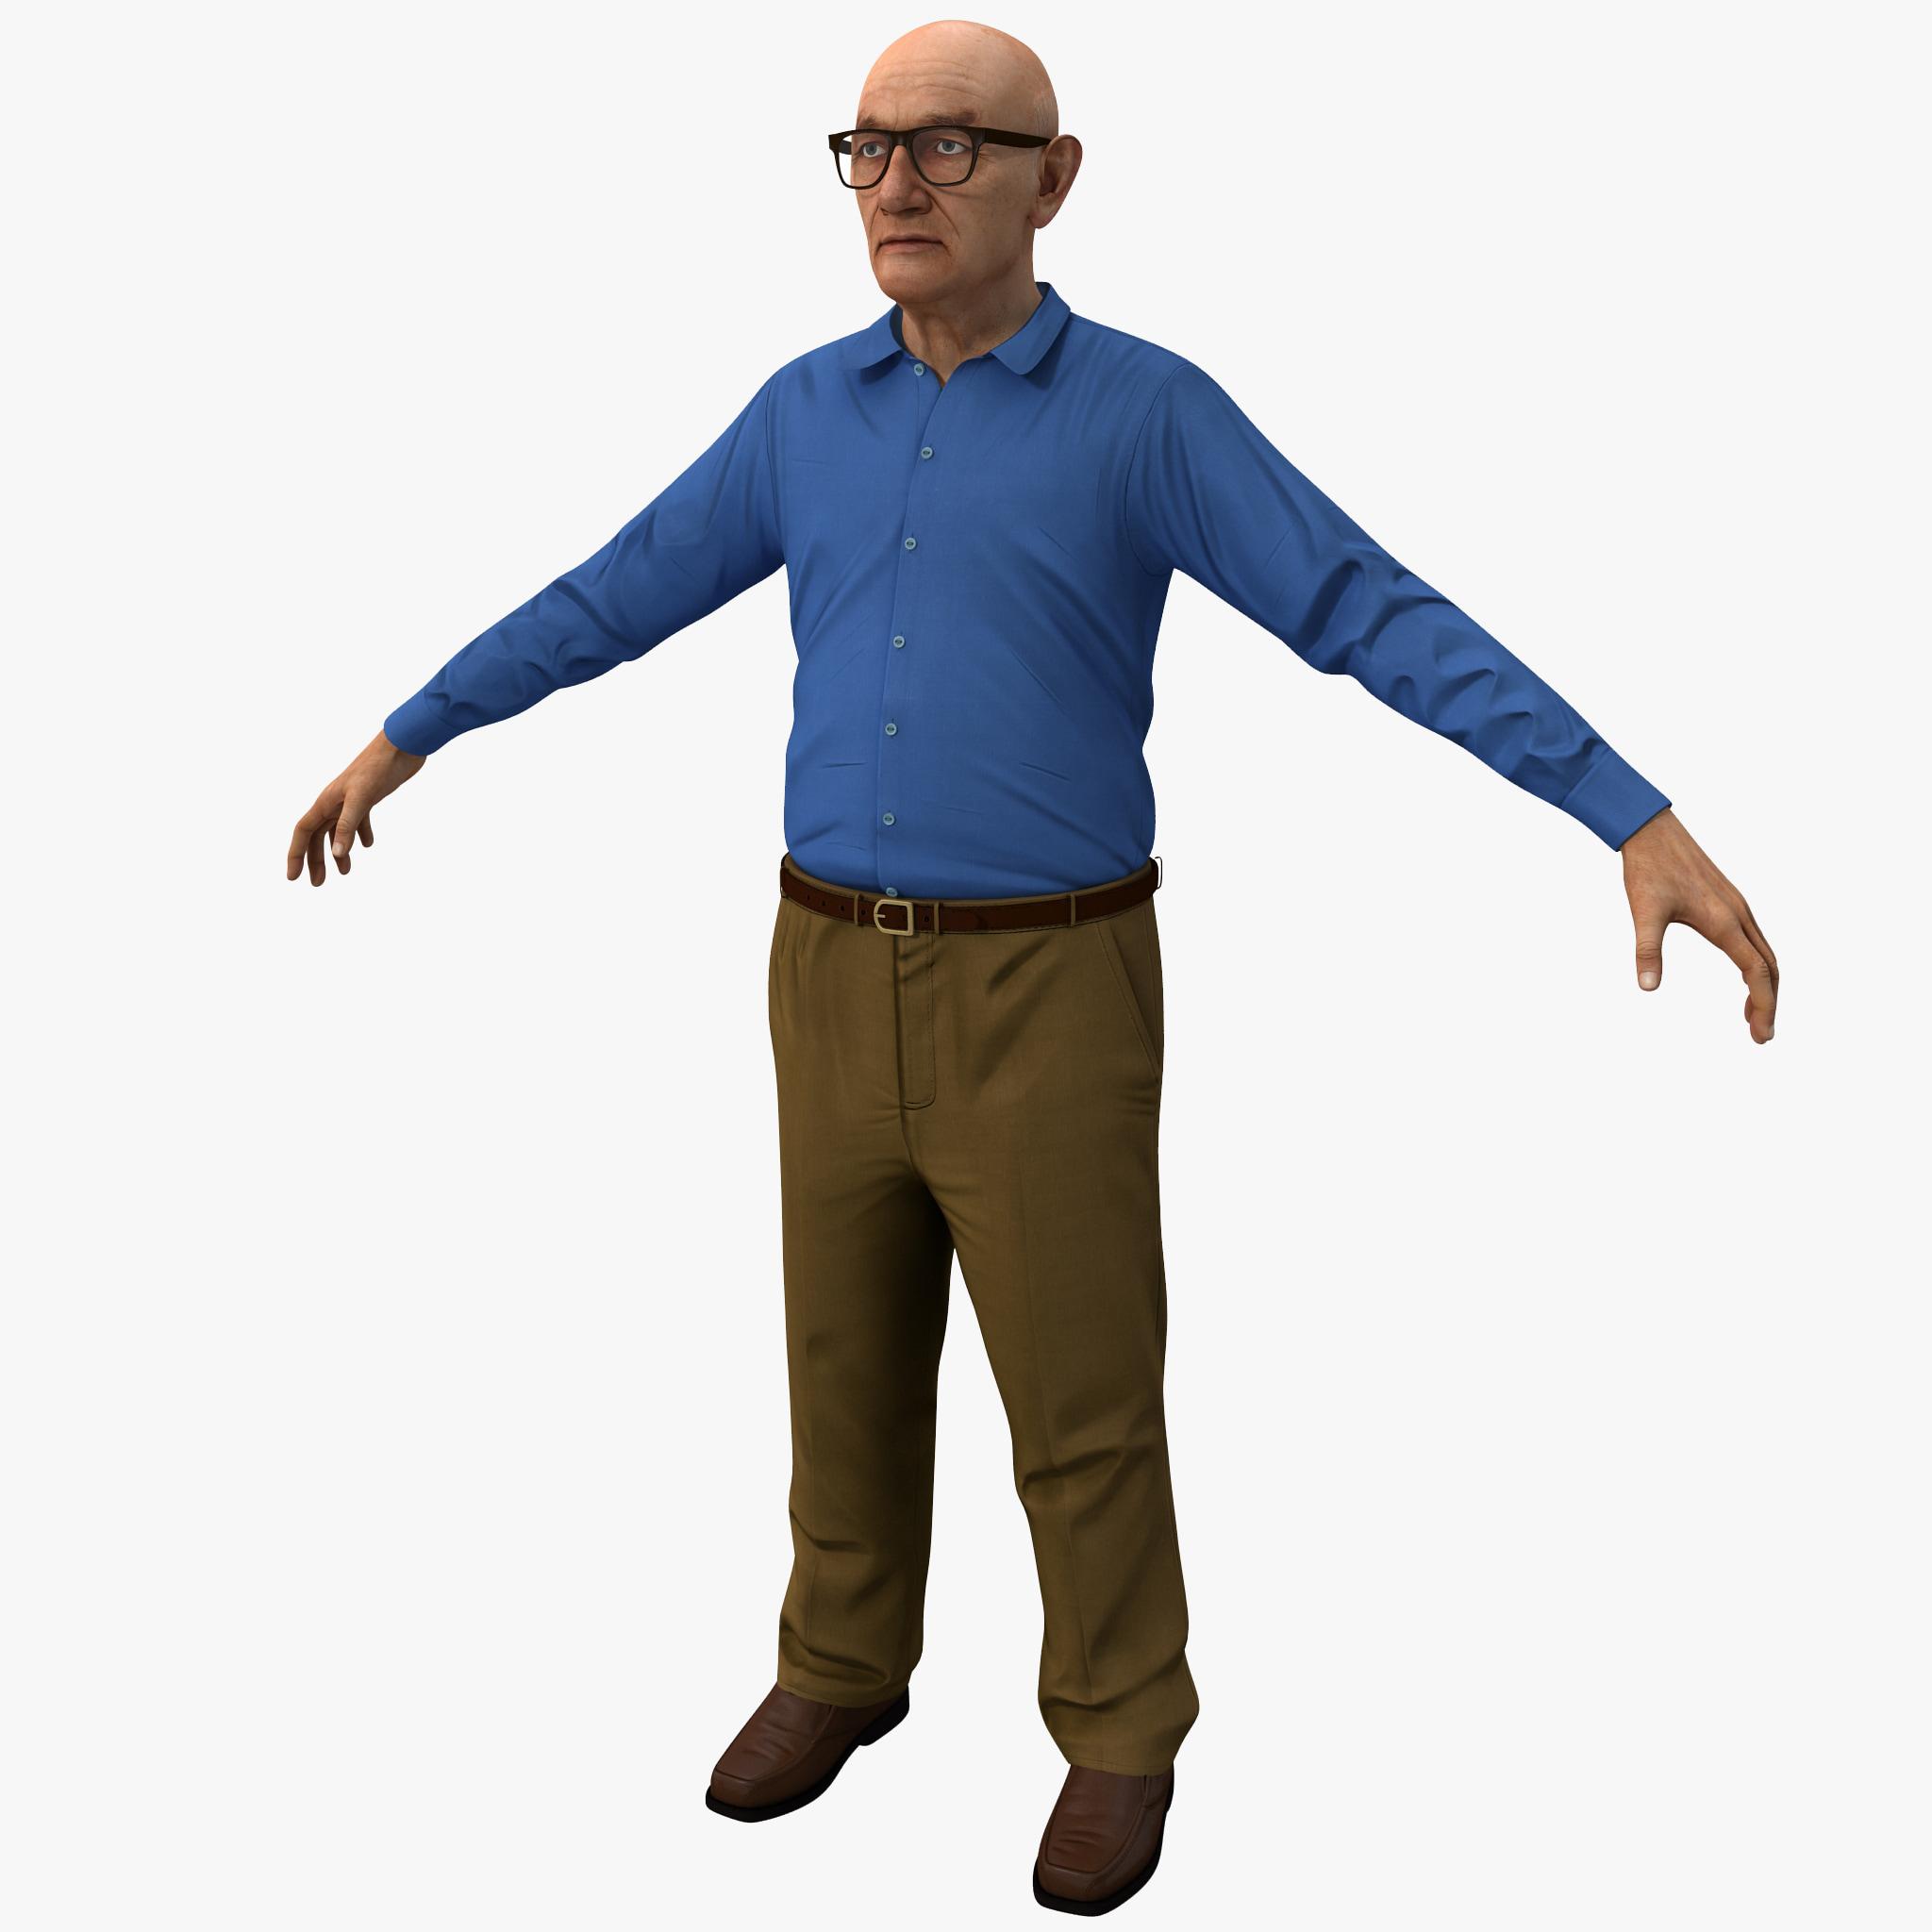 Elderly Man Rigged 2_1.jpg